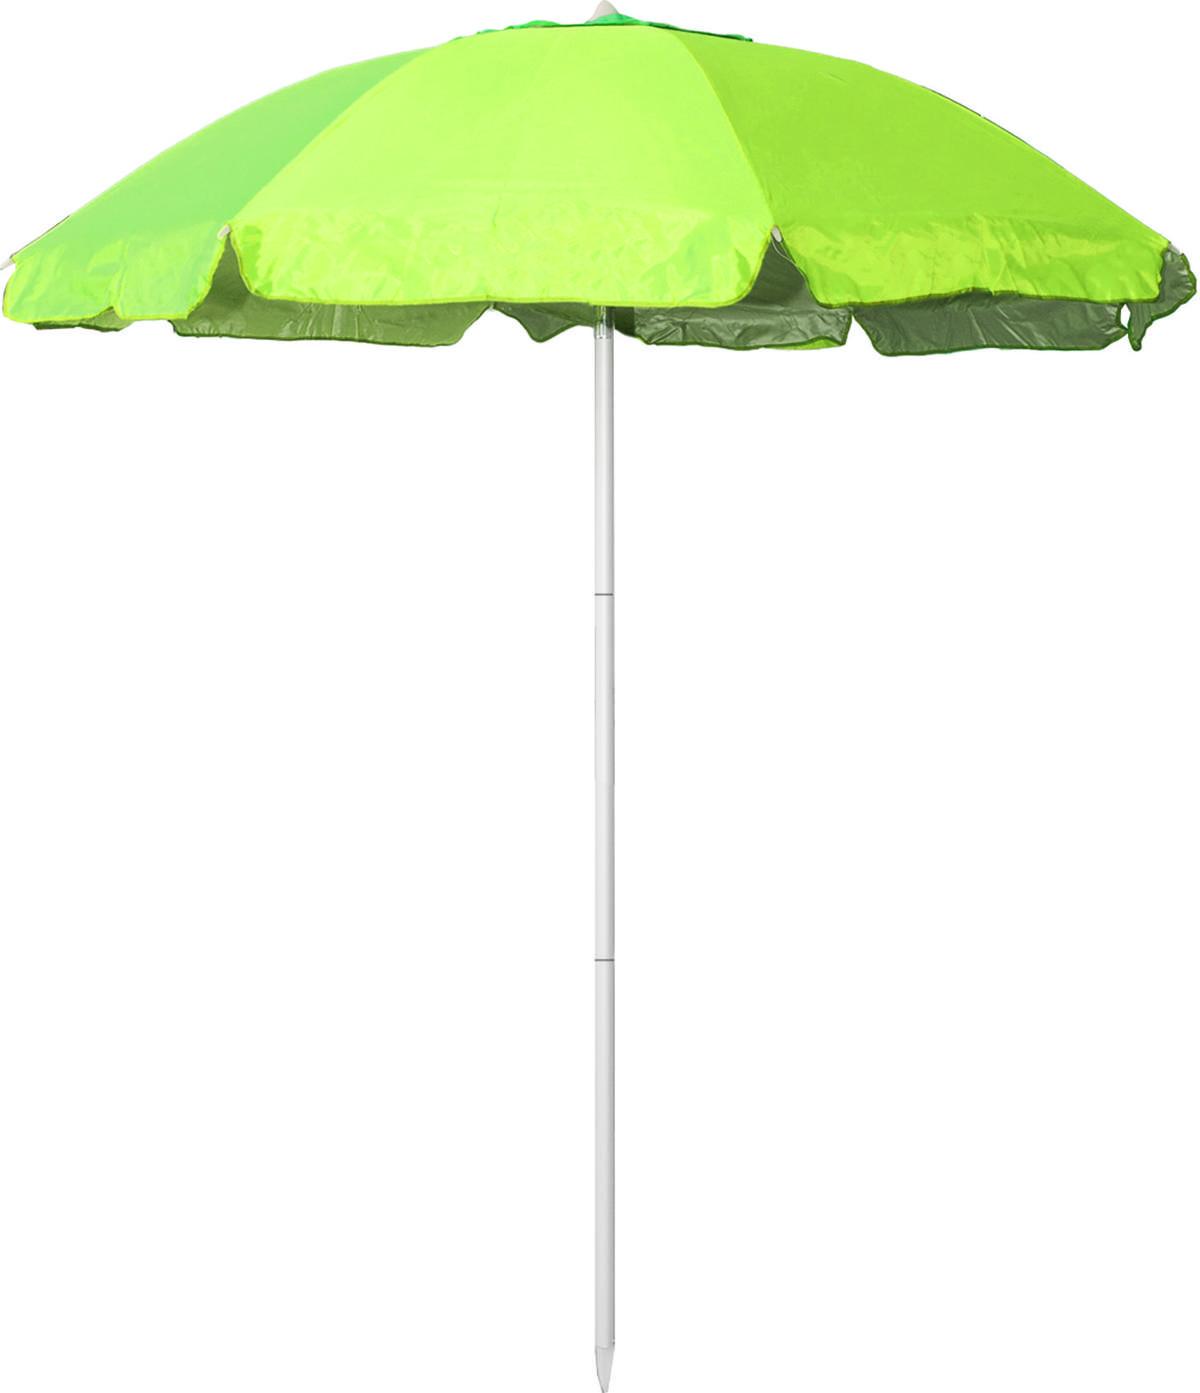 sun-parasol-180